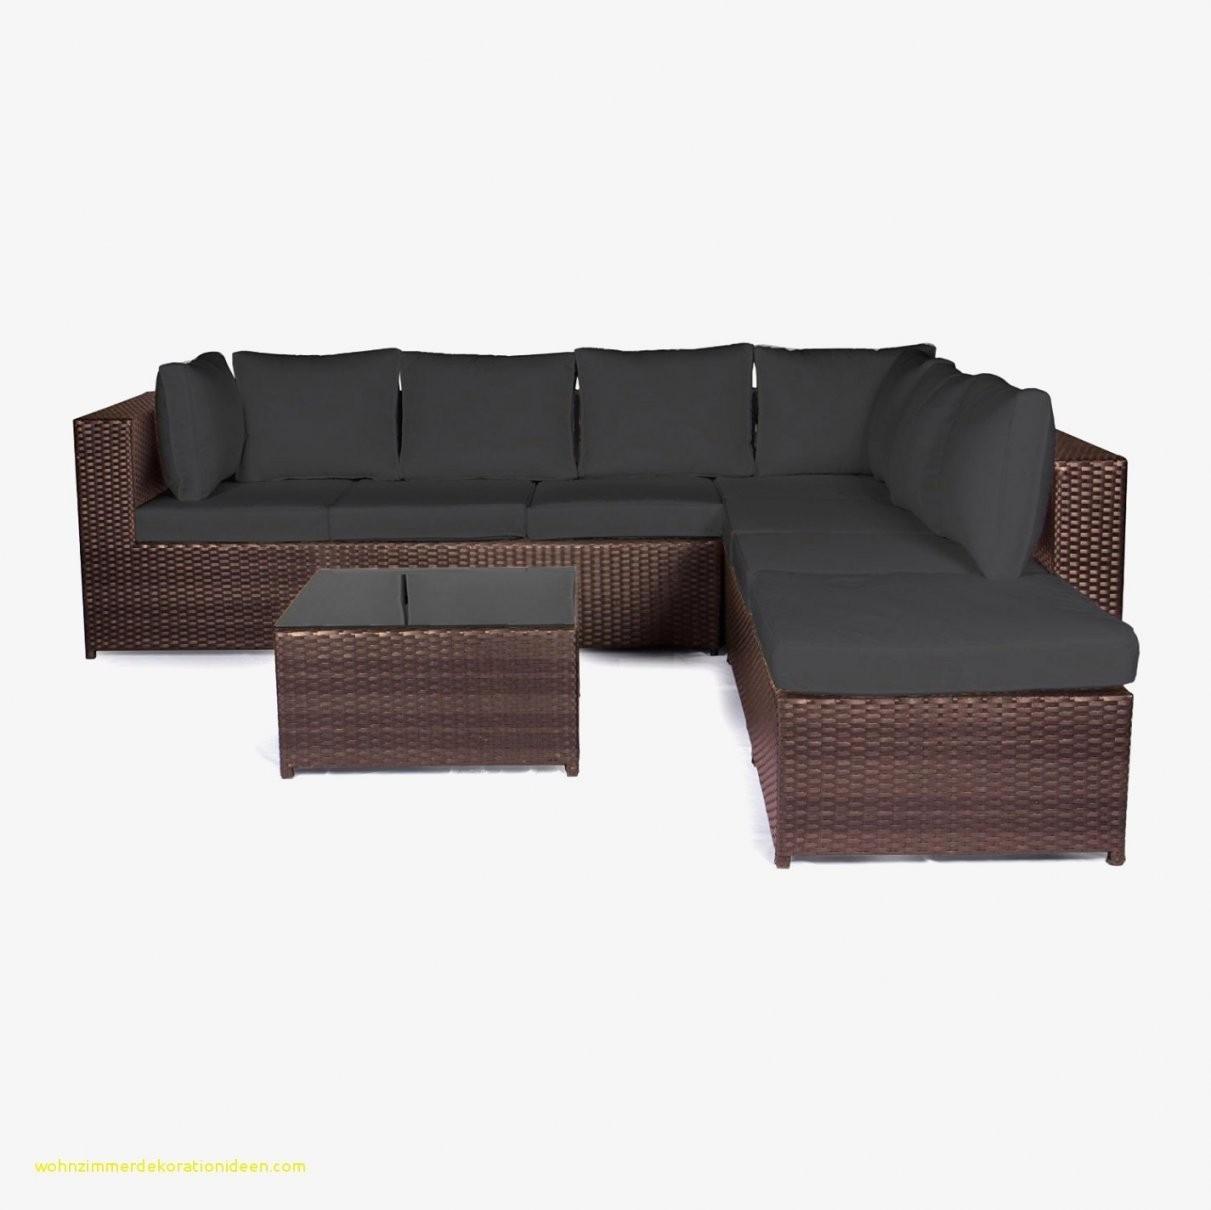 Rattan 2 Sitzer Klasse 50 Elegant Rattan Sofa Set 50 S  32 Fein von Polyrattan Sofa 2 Sitzer Bild